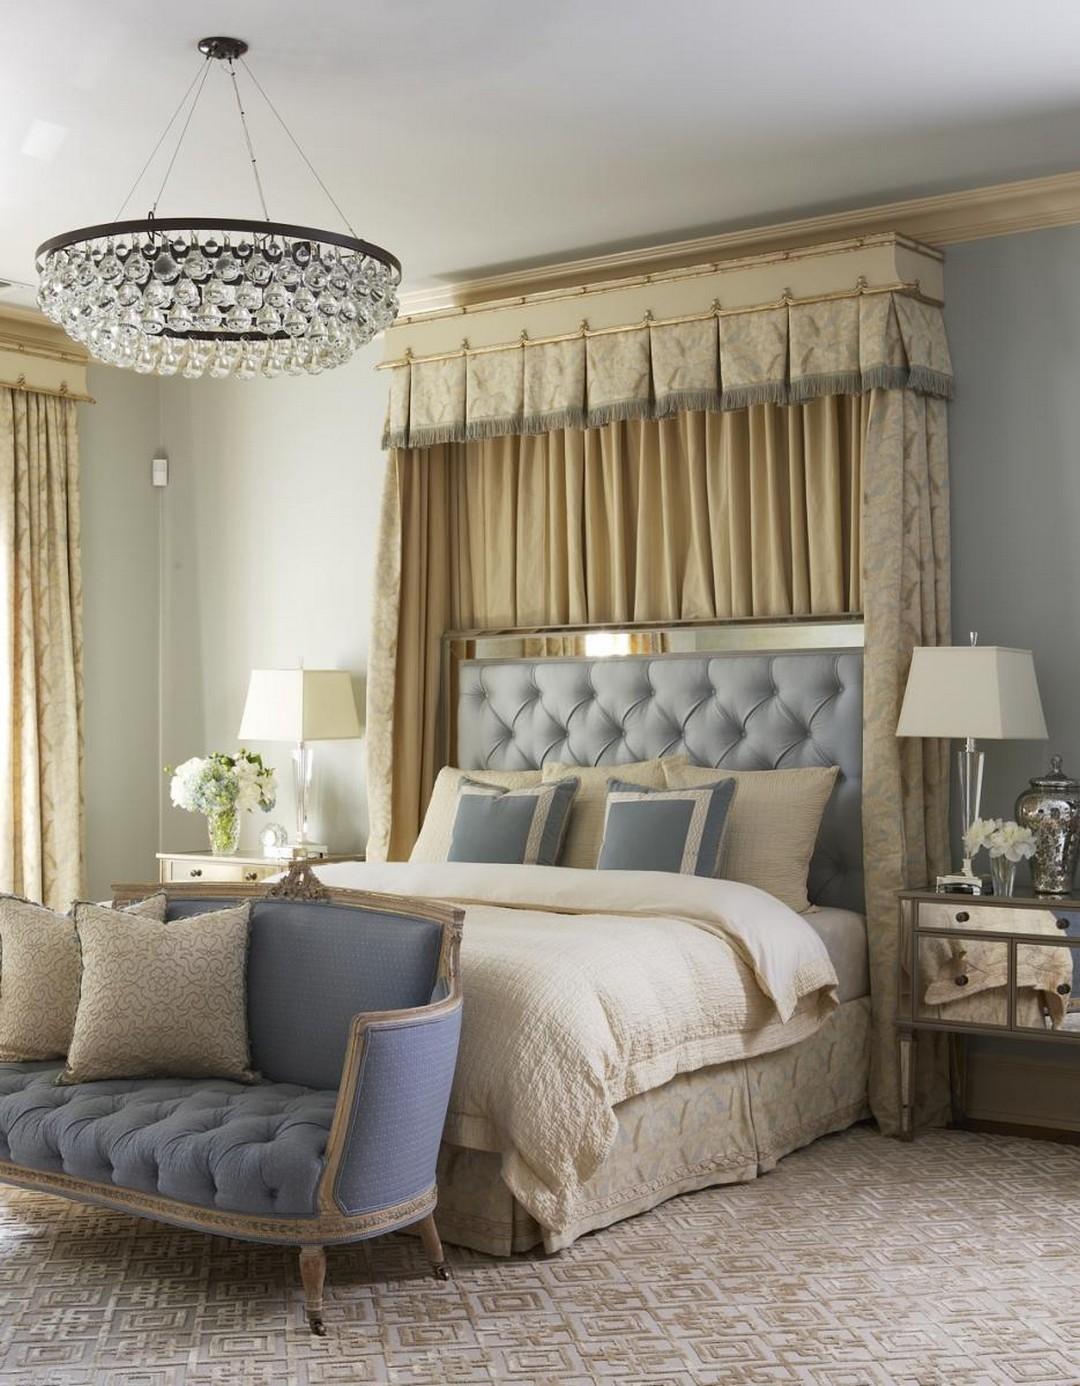 traditional romantic bedroom ideas photo - 8